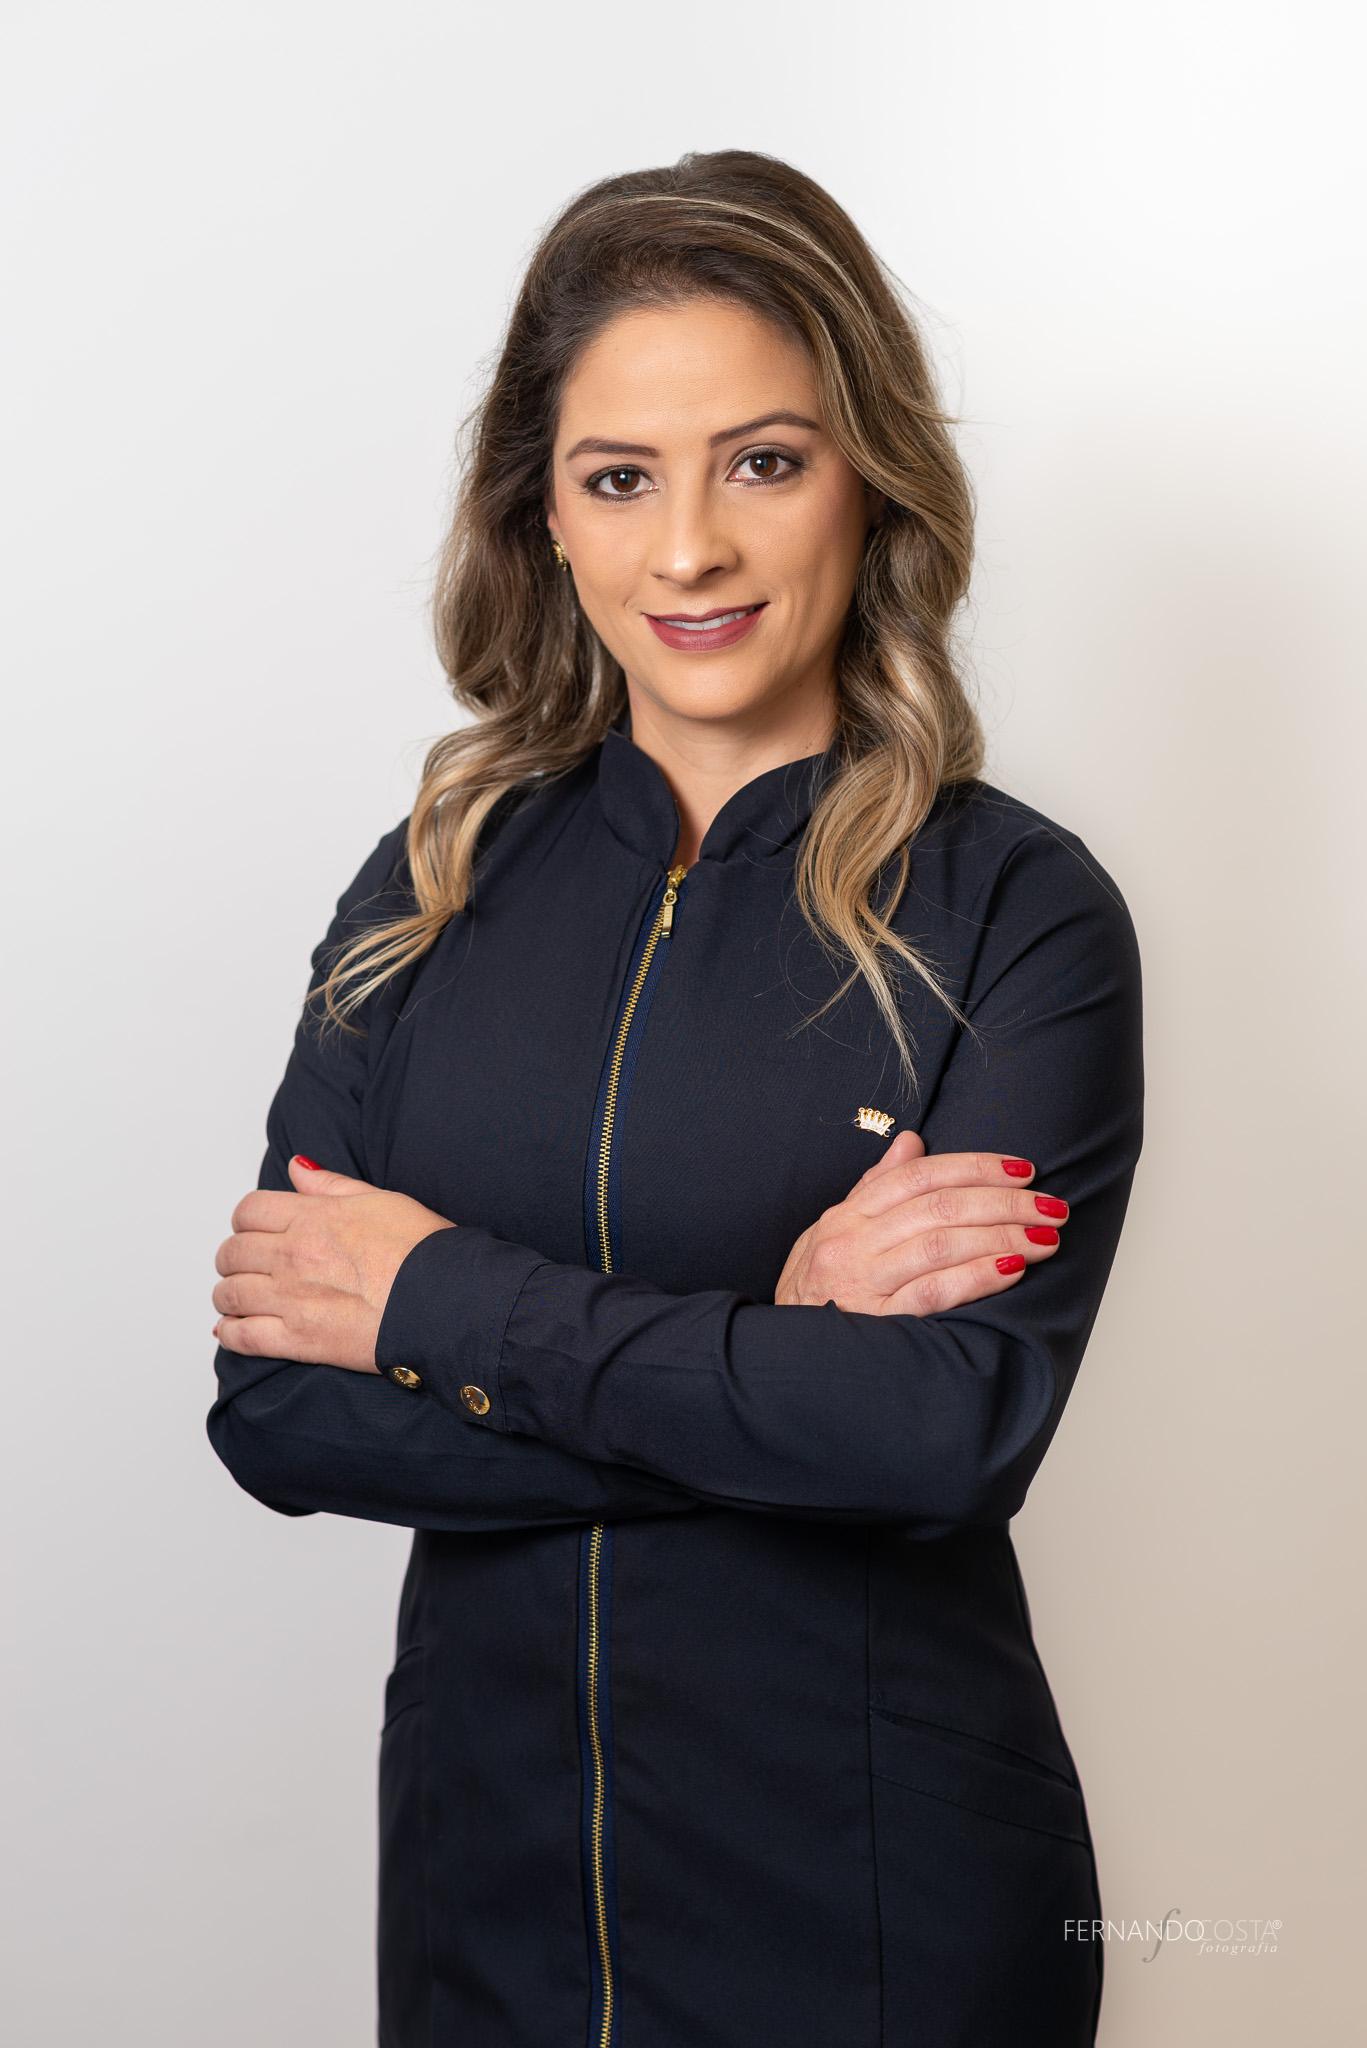 Ana Paula Miranda Furbino